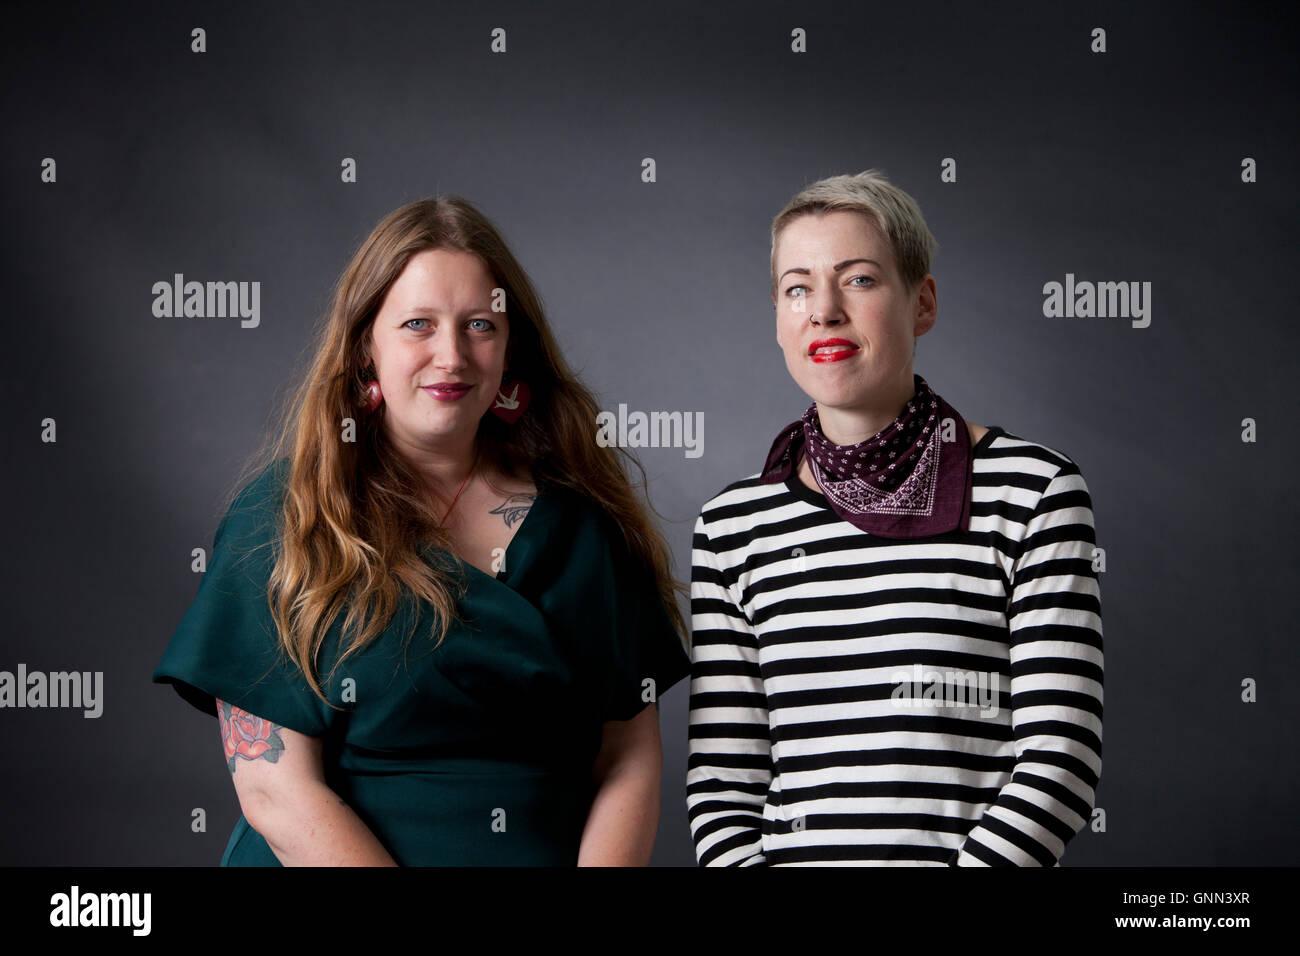 Claire Askew (left) and Helen Mort, at the Edinburgh International Book Festival. Edinburgh, Scotland. 13th August - Stock Image